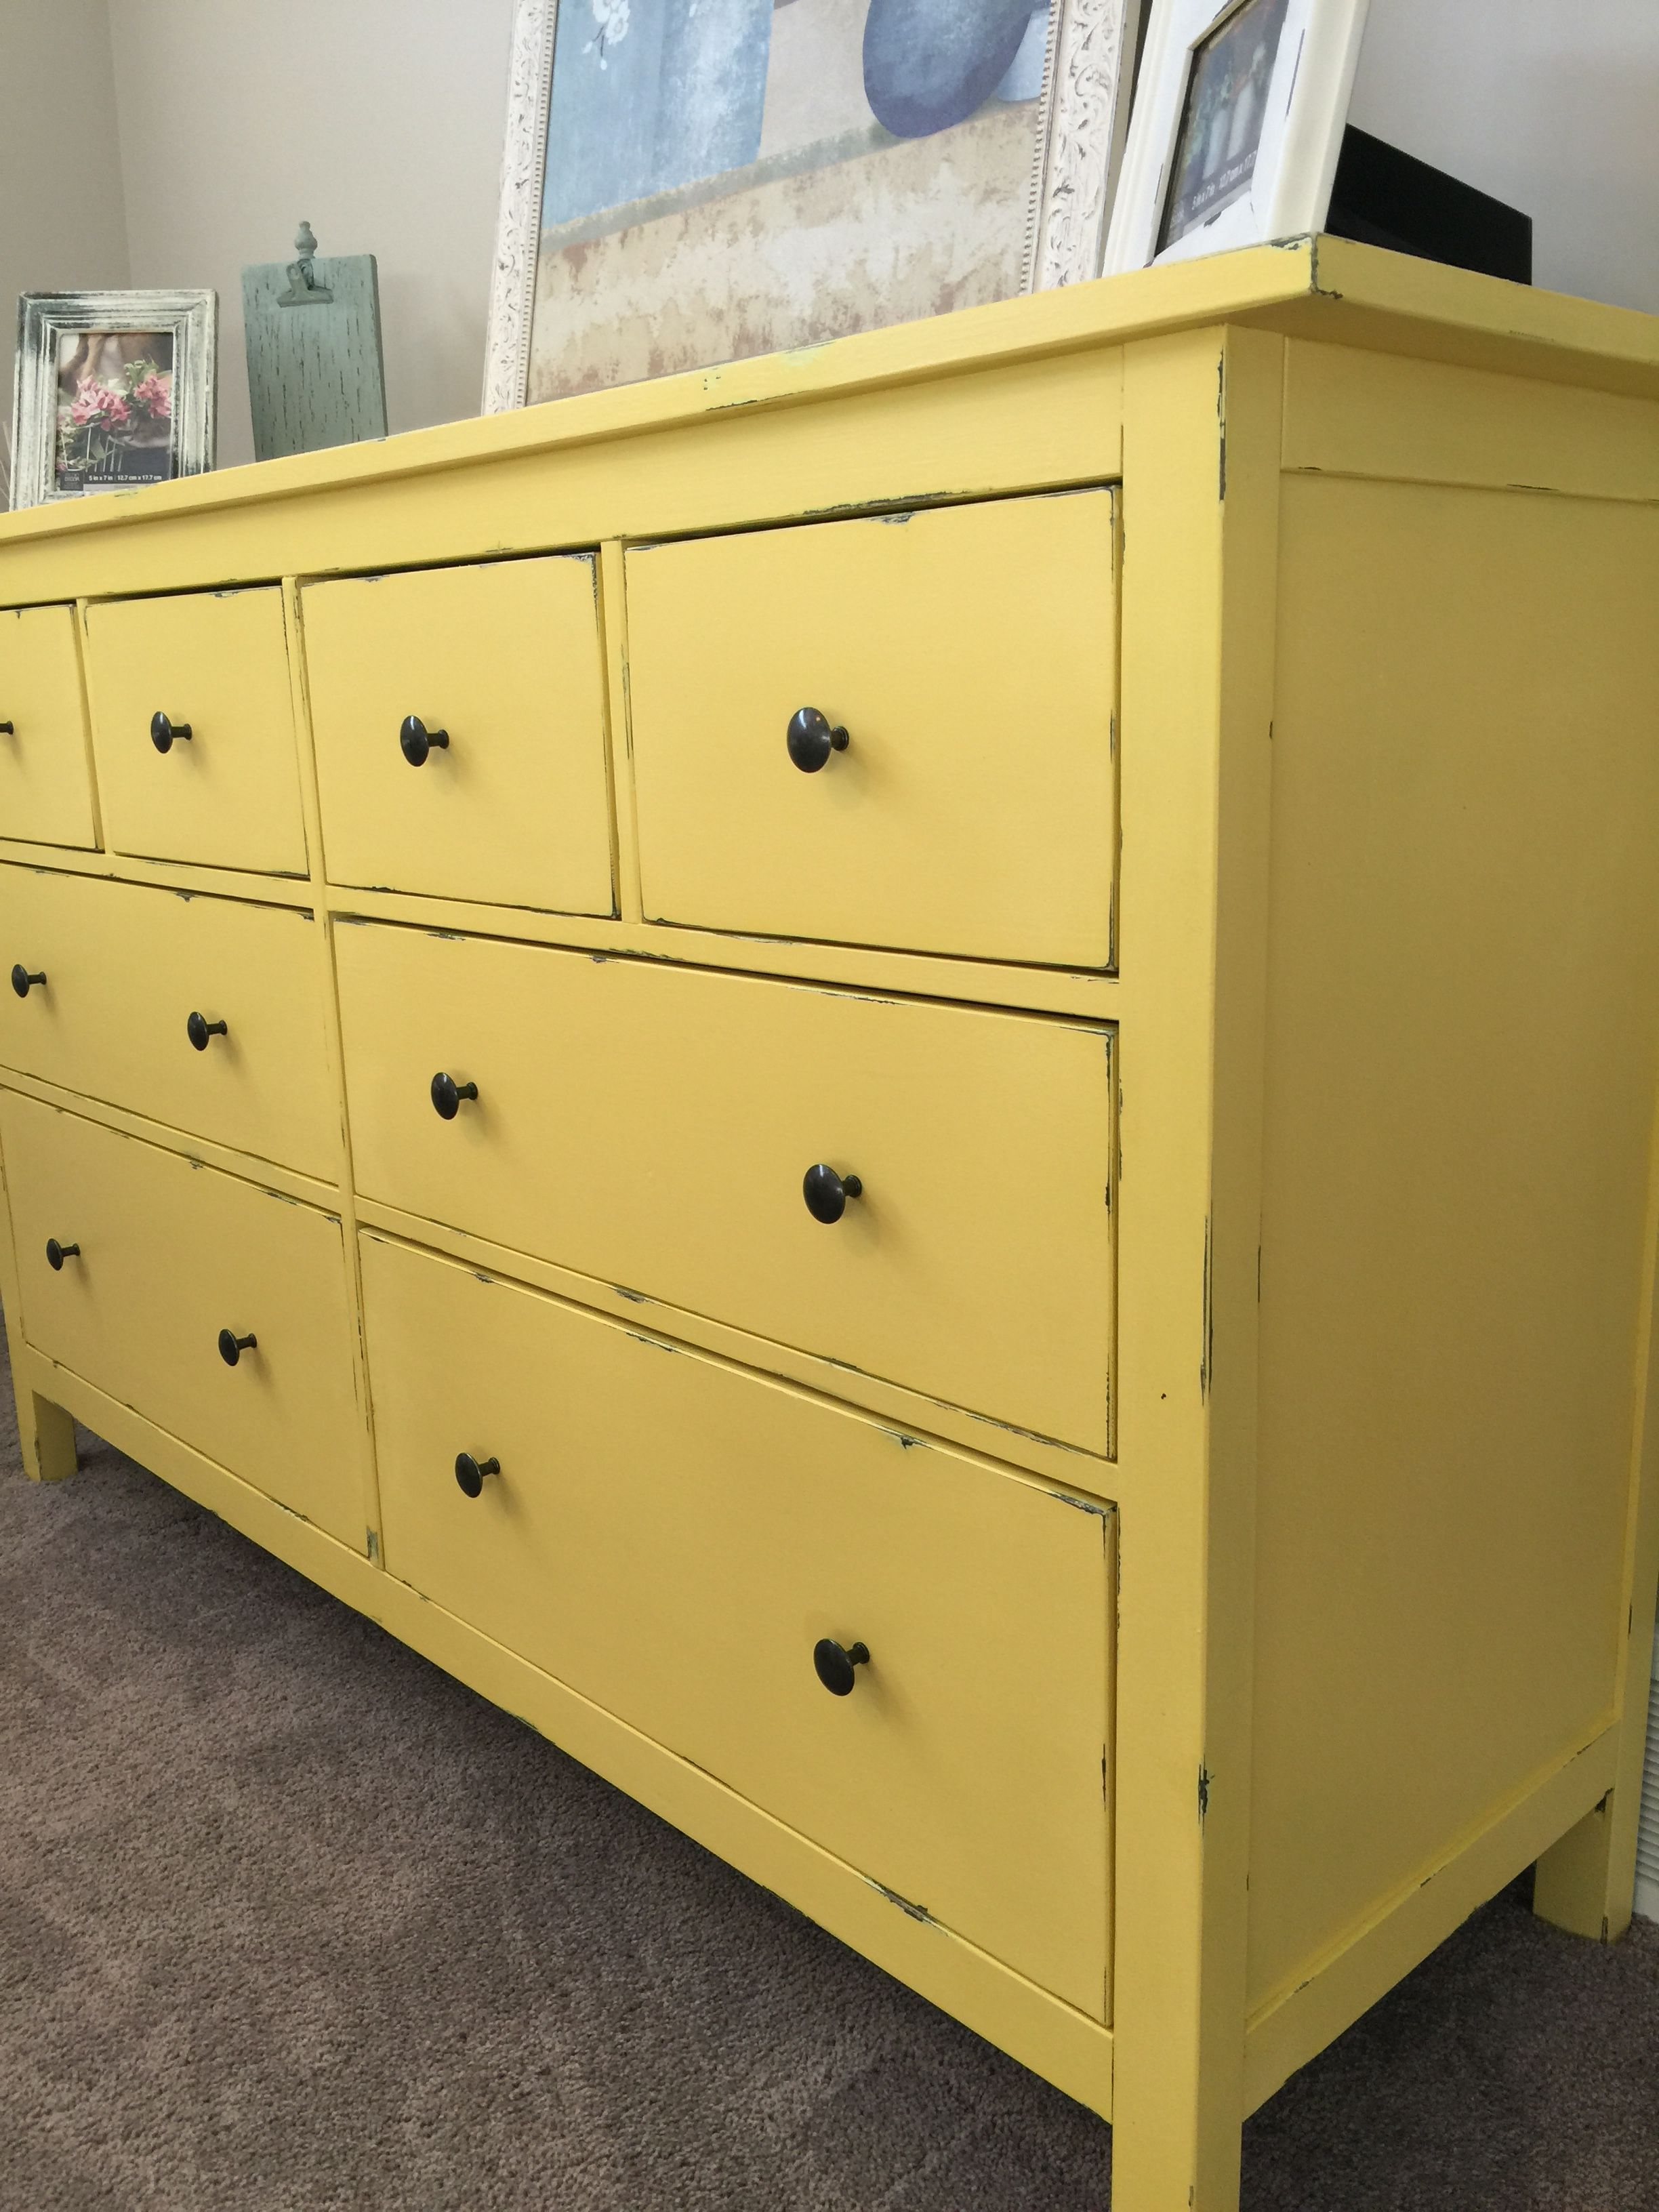 Rustoleum chalk paint refurbished ikea hemnes dresser for Chalk paint muebles ikea